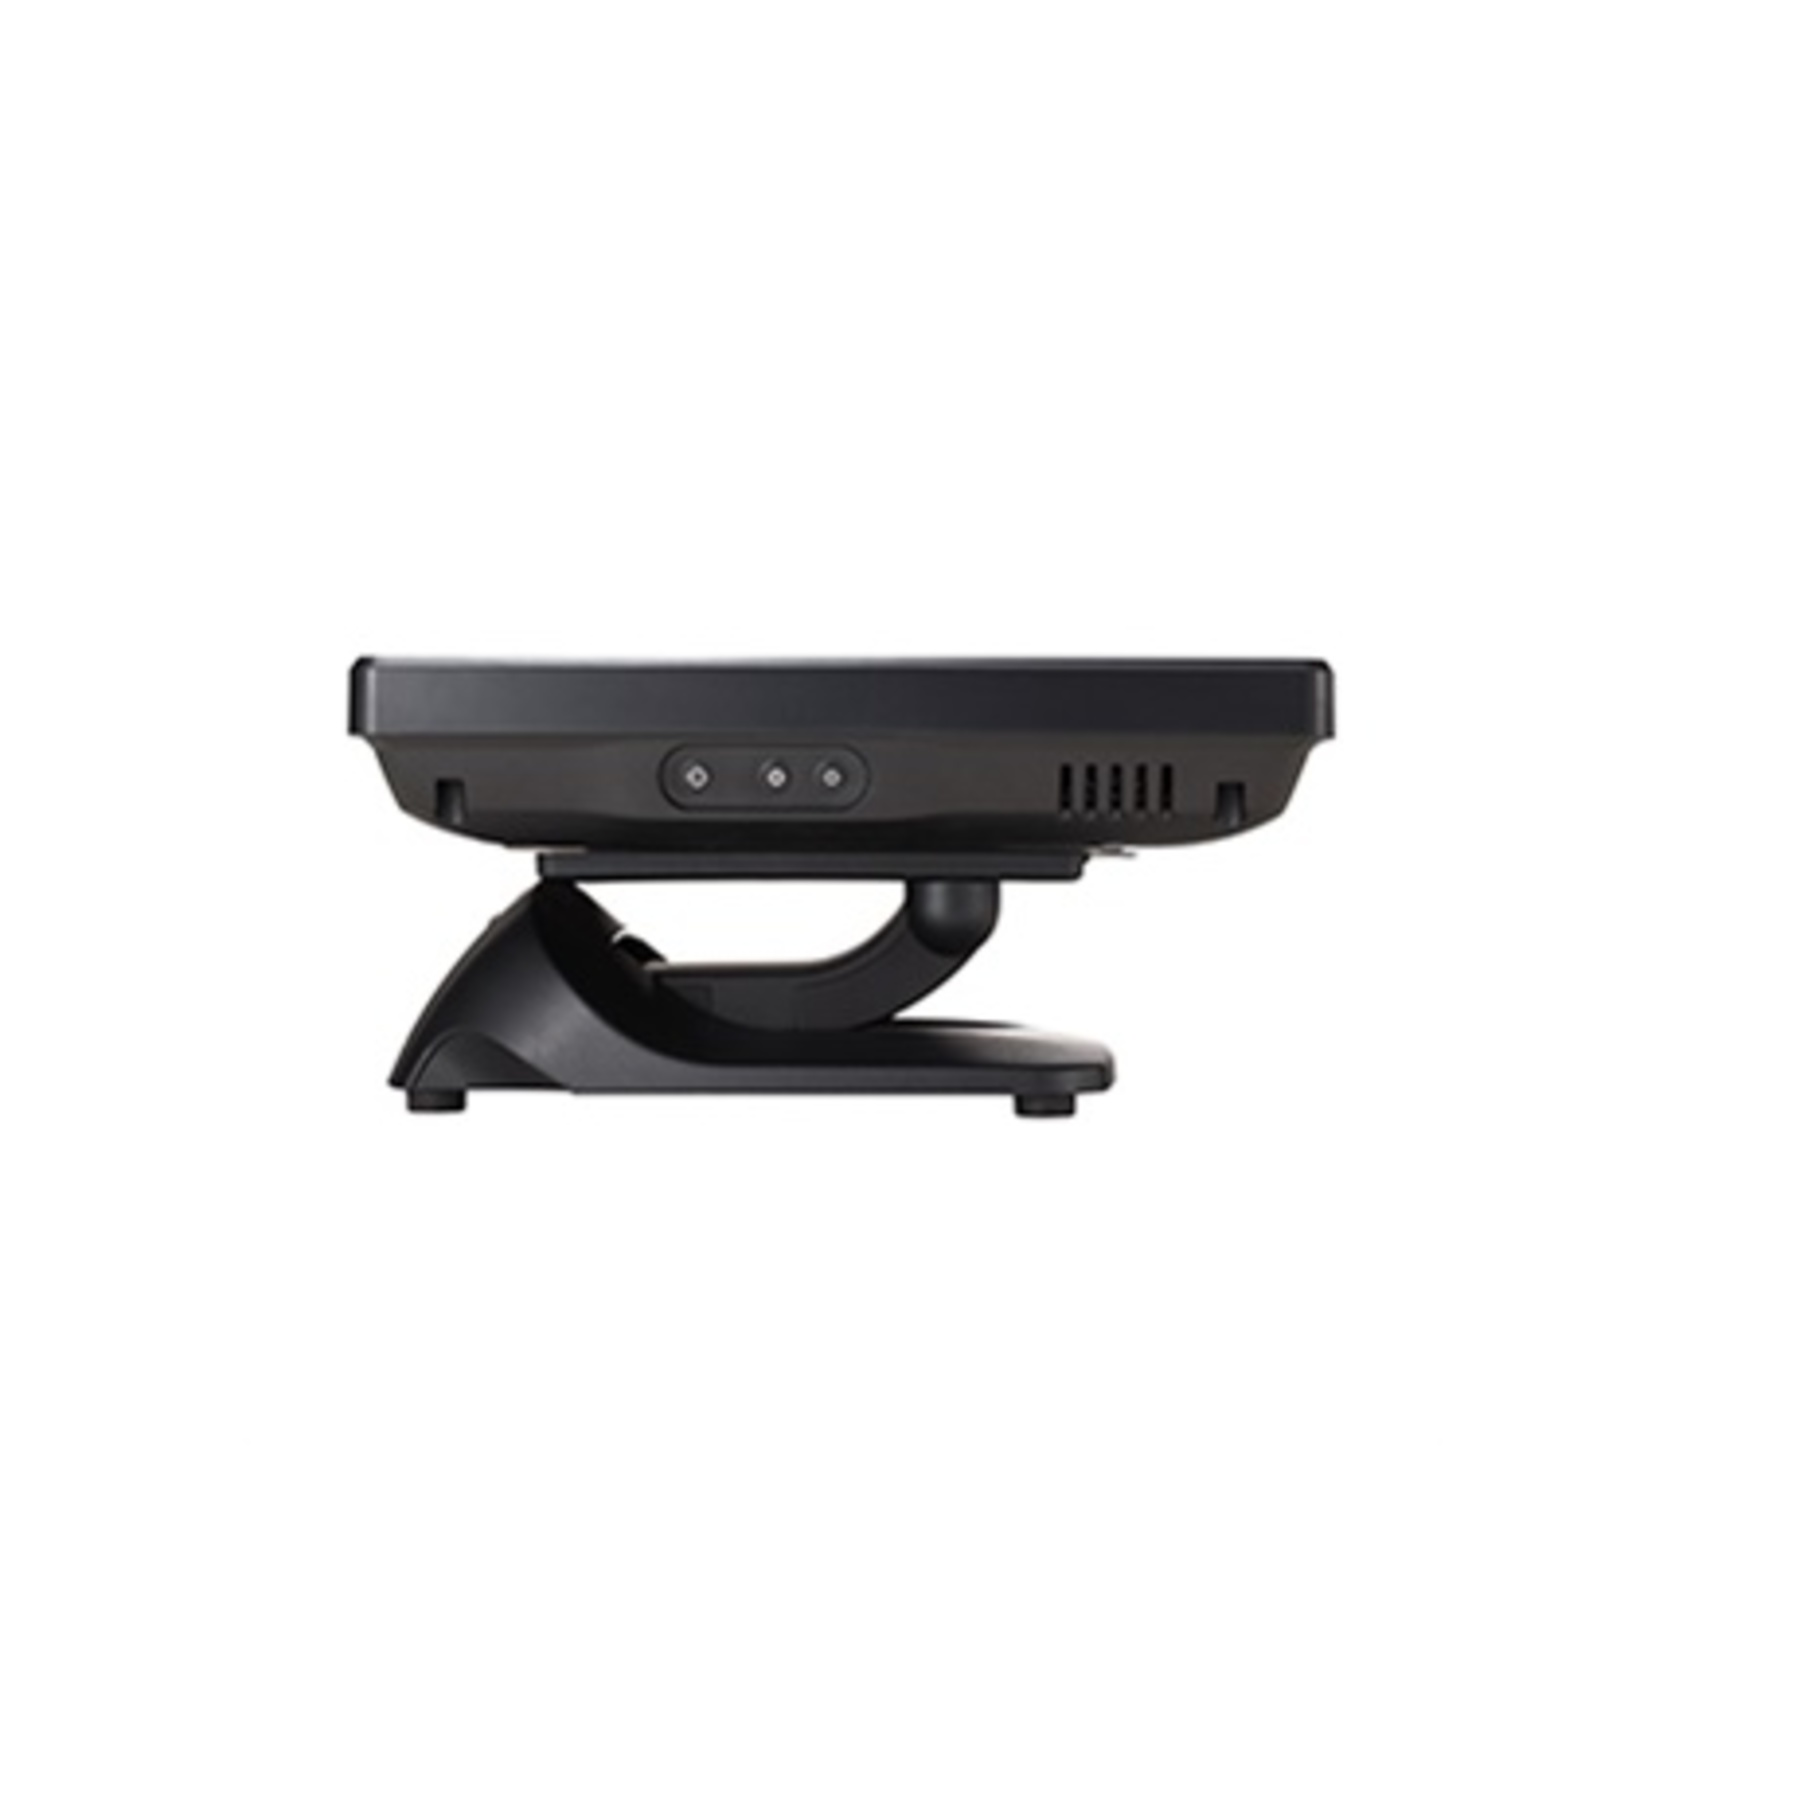 Posiflex XT-5515 Touchscreen Terminal | Cash Drawers Ireland